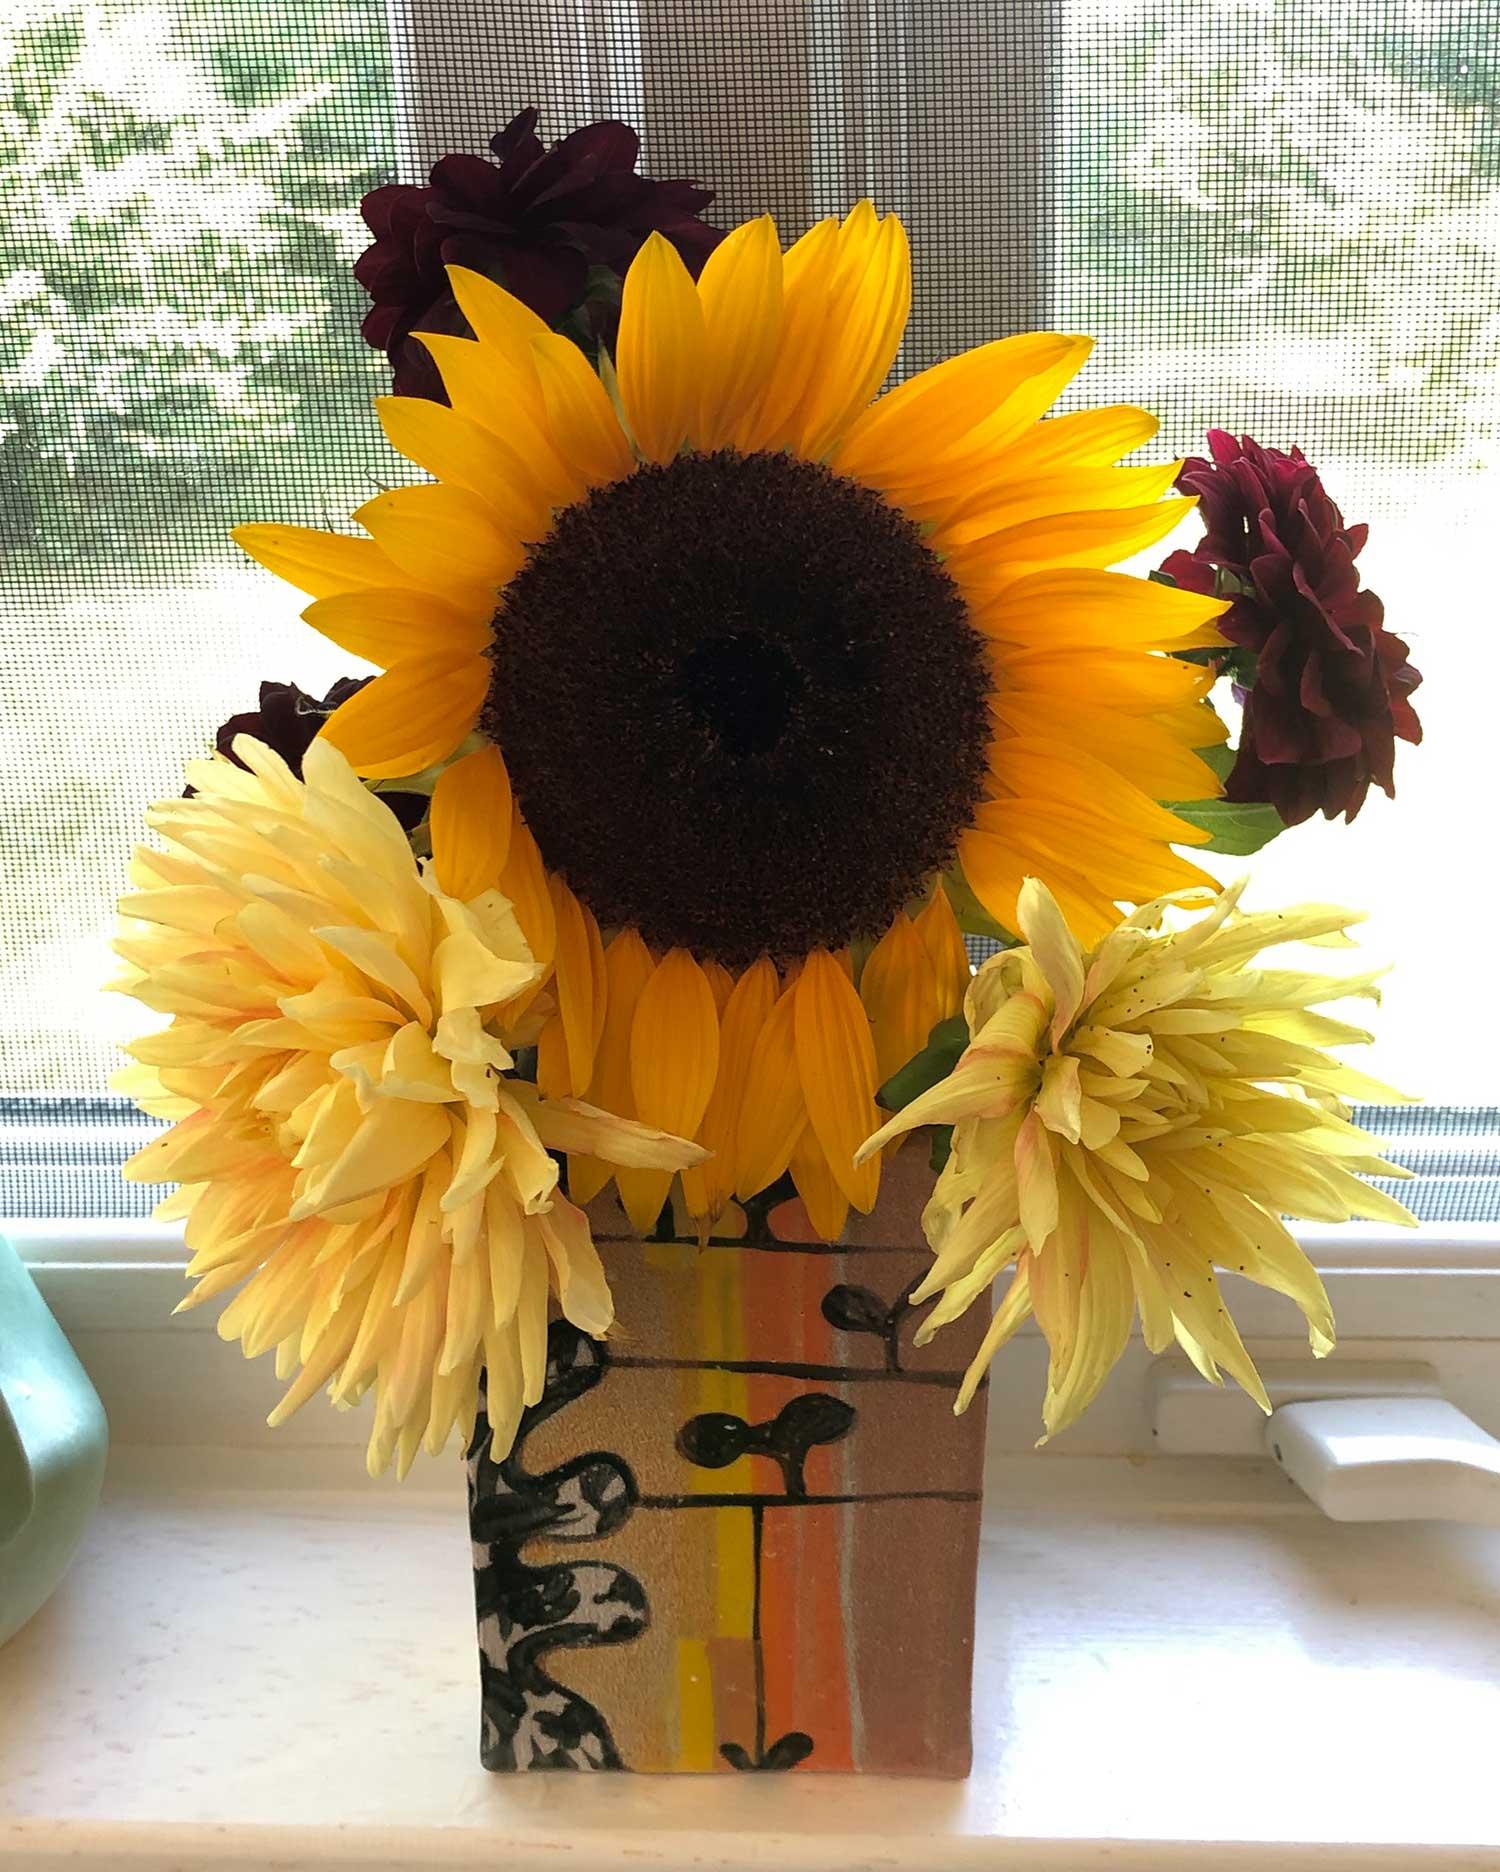 holly_hughes_other_ceramics_vase_sunflowers_site.jpg